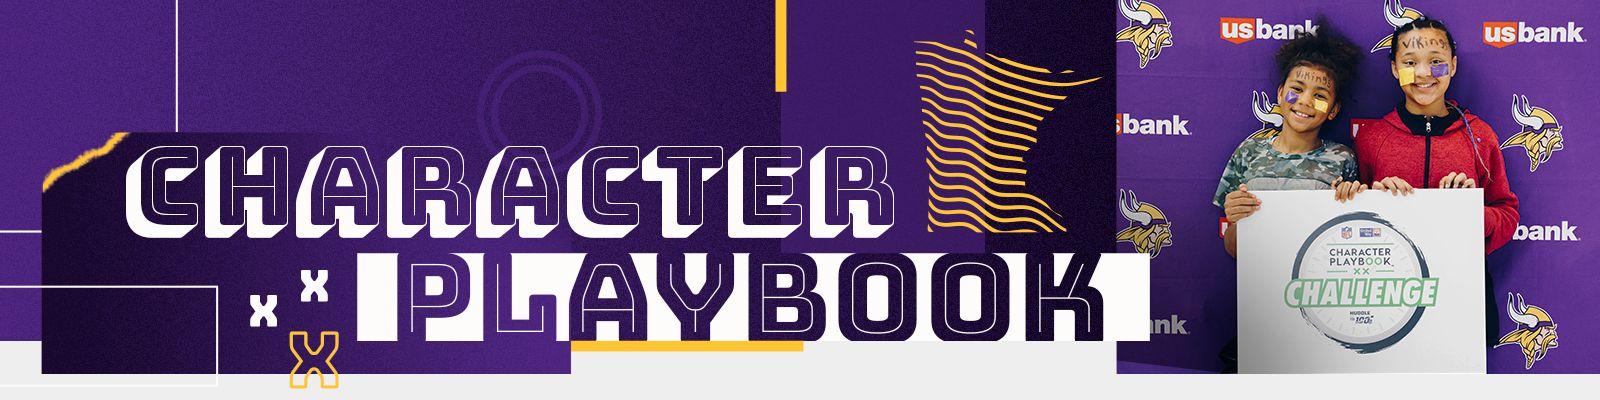 CharacterPlaybook_Header_1600x400